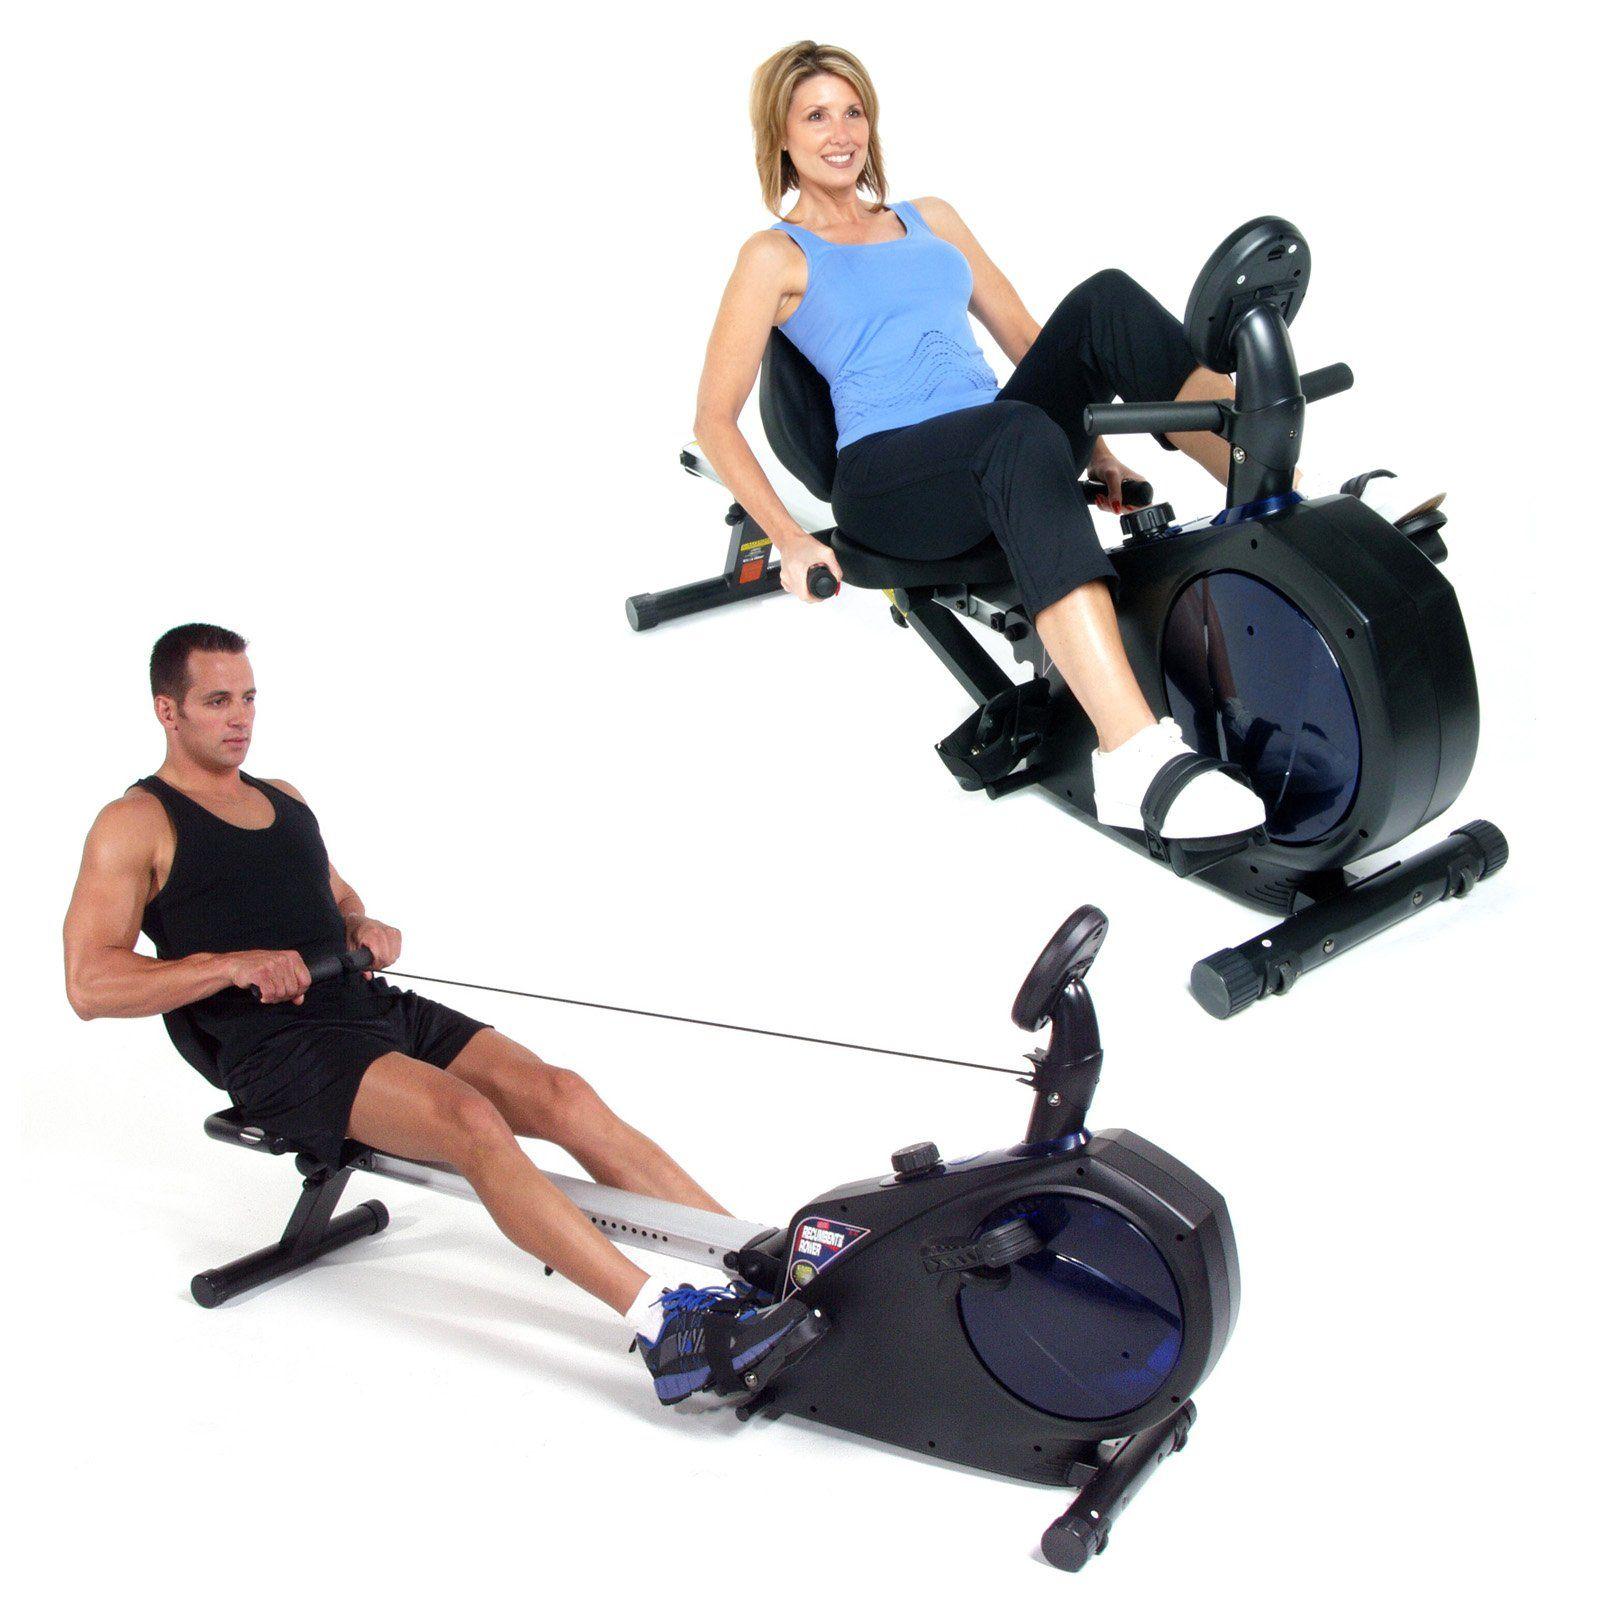 Have To Have It Stamina Avari Conversion Ii Rower Recumbent Exercise Bike 699 99 Hayneedle Recumbent Bike Workout Biking Workout Exercise Bikes